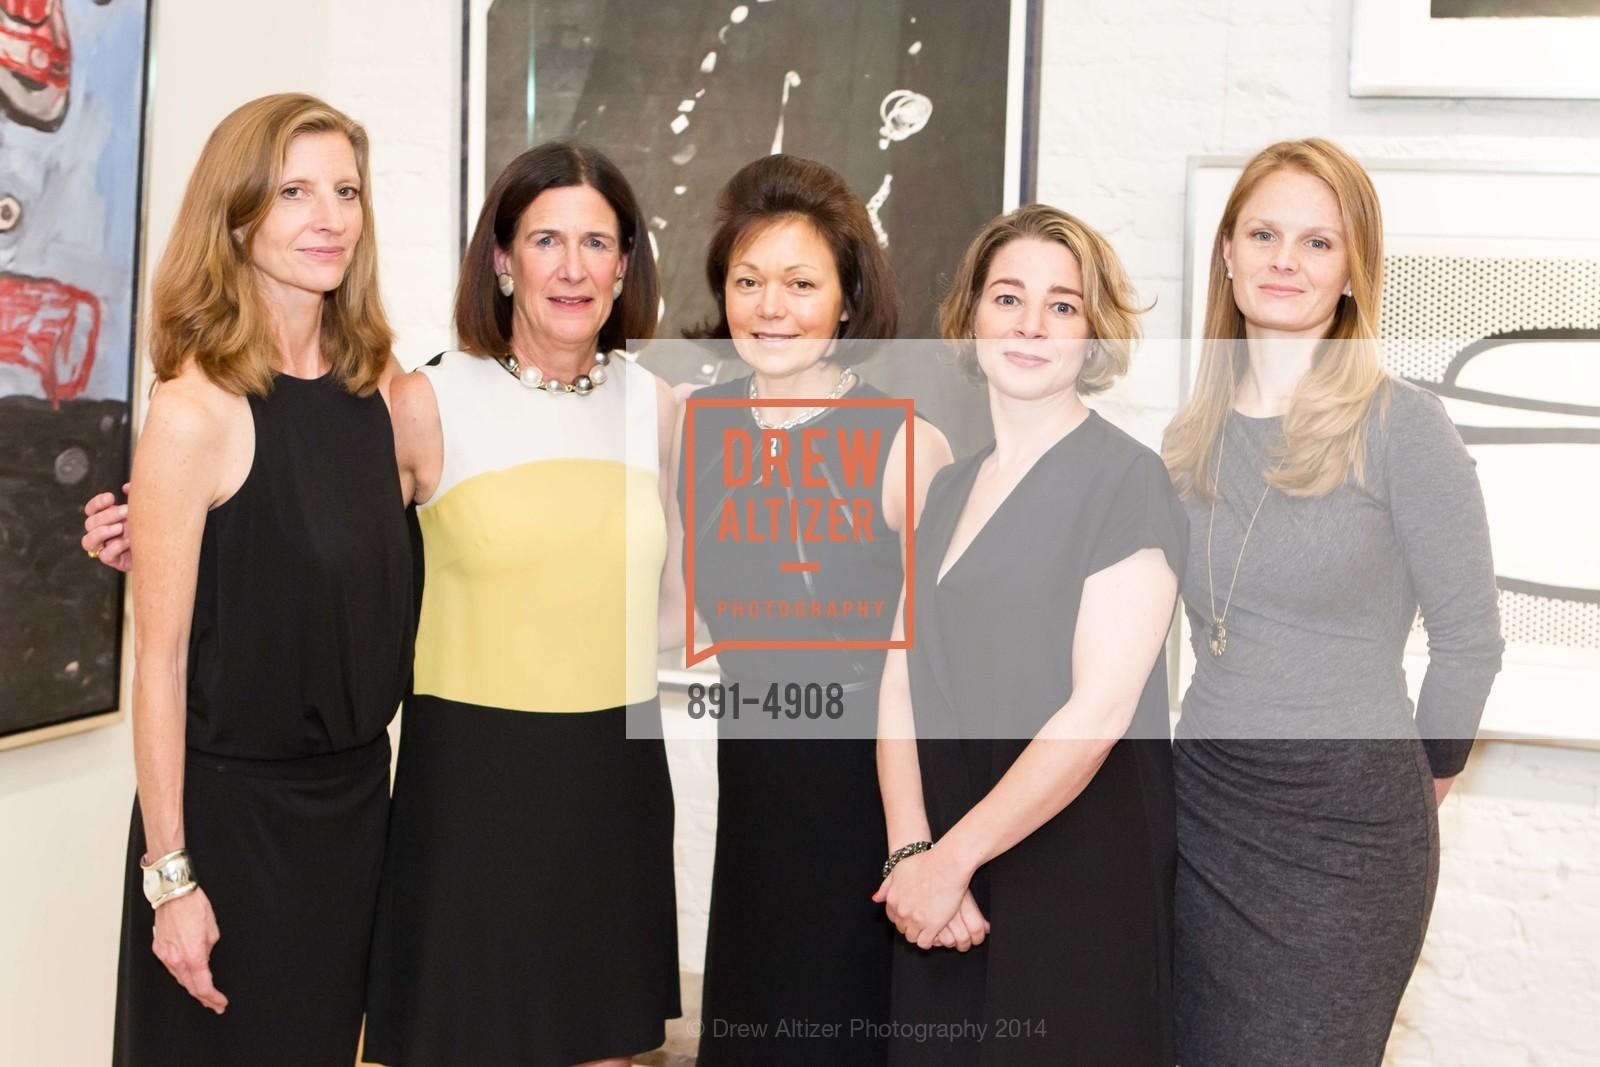 Laura Nagle, Ellanor Notides, Laura Paulson, Melissa Emergui, Charlie Adamski, Photo #891-4908